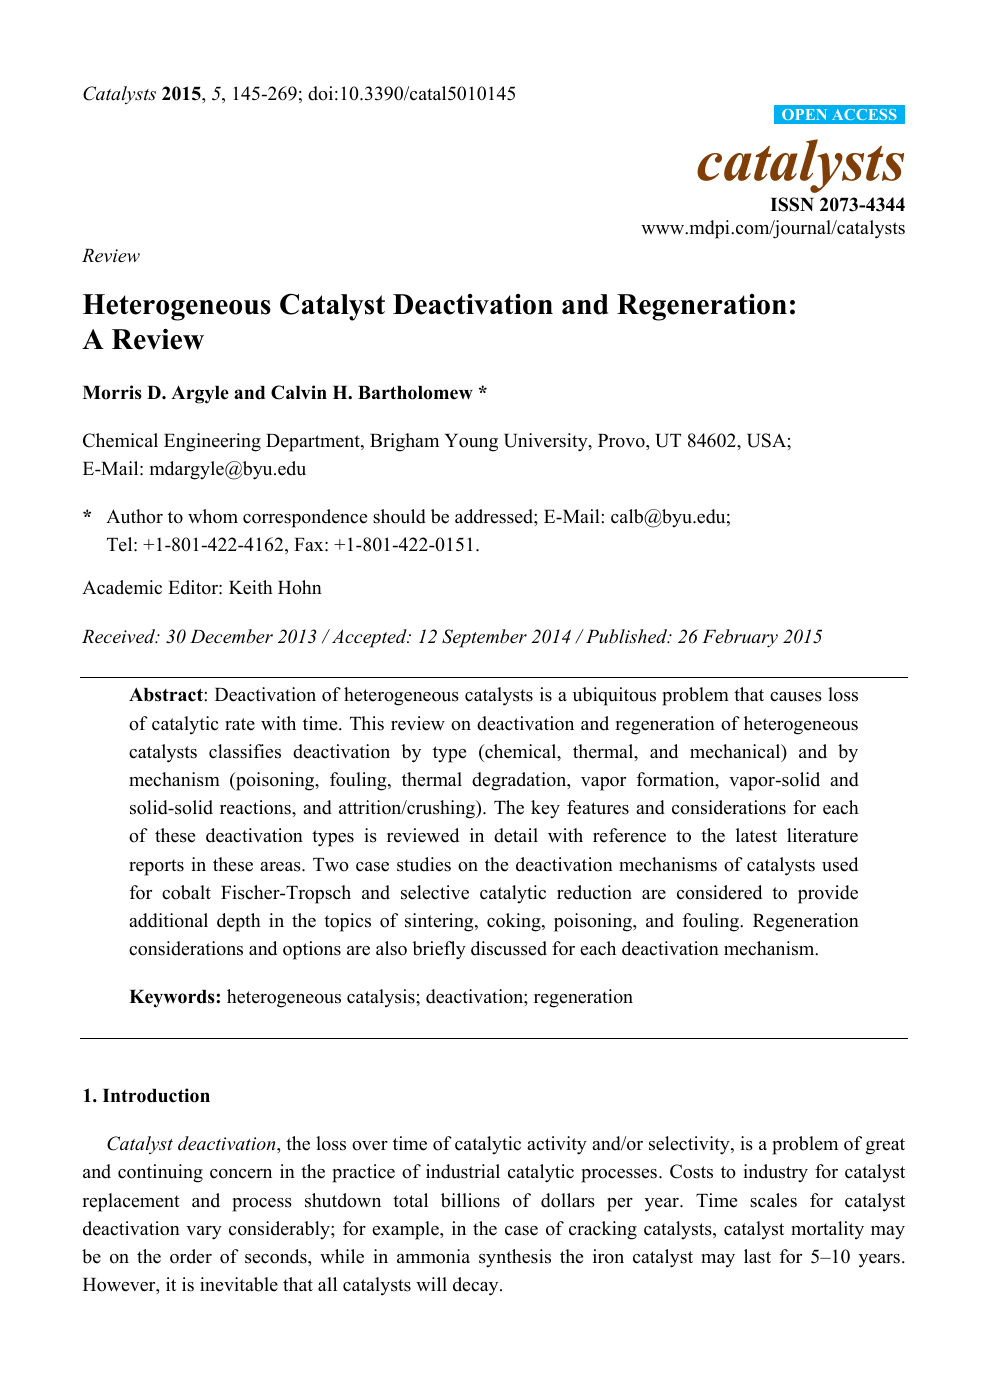 Heterogeneous Catalyst Deactivation and Regeneration: A Review